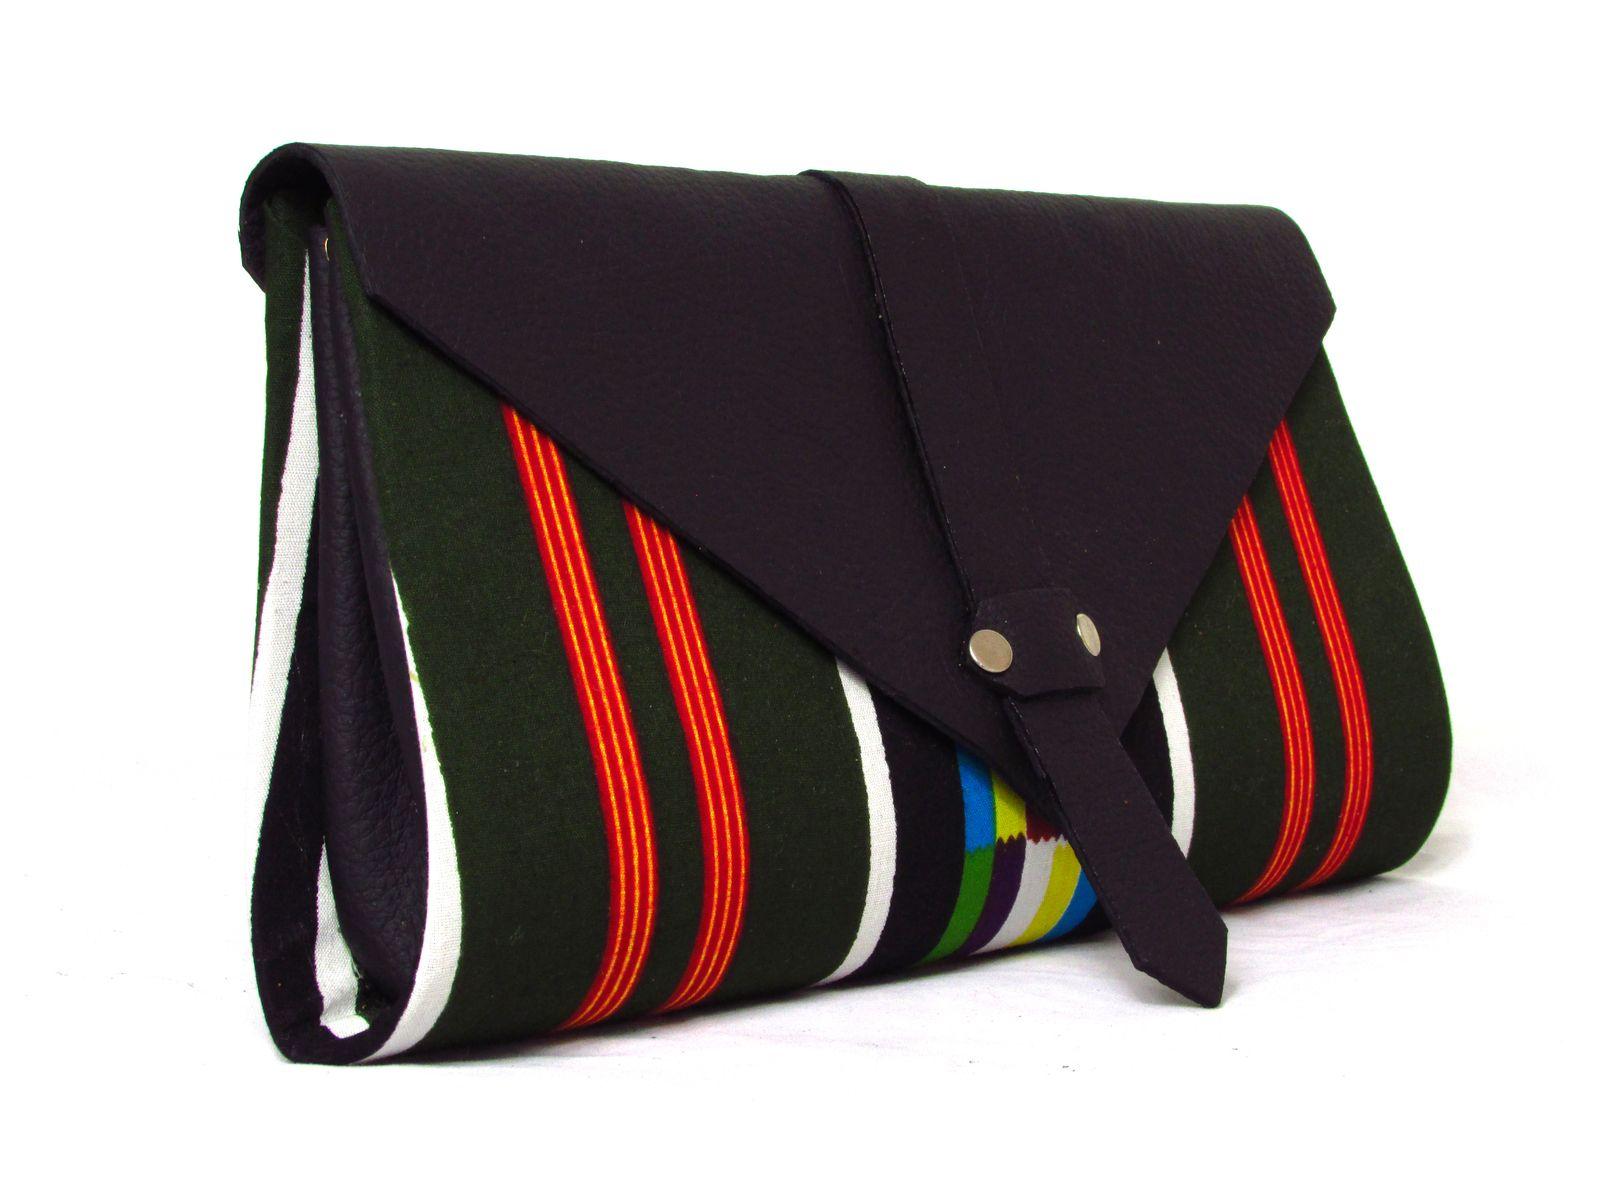 Fundi Unique Handmade African Bags Layla Modern Tradition Australia African Bag Handmade Handbags Handmade African